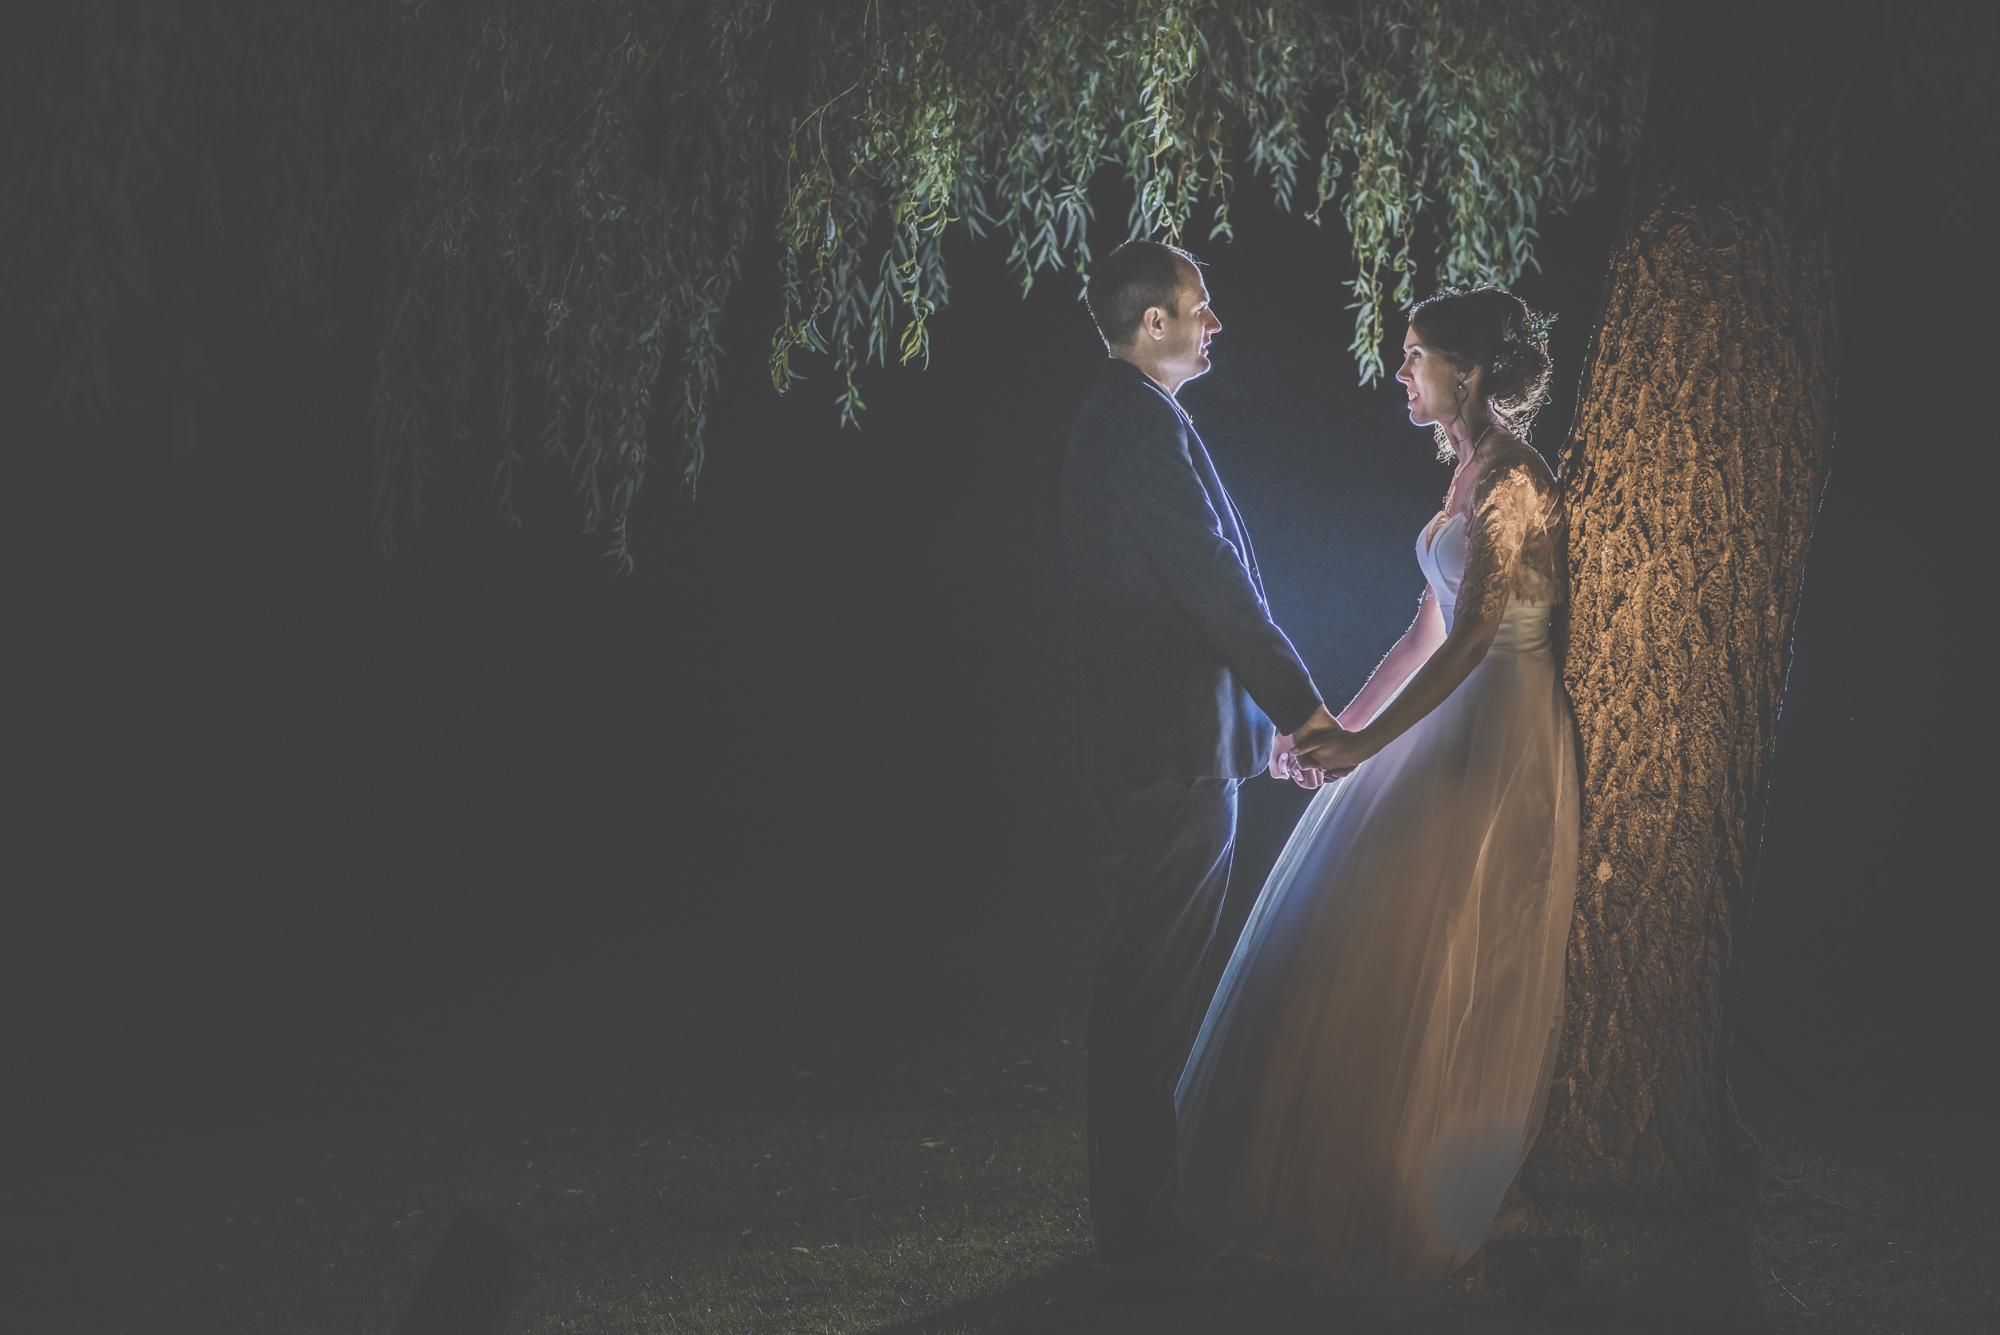 Charisse-and-James-wedding-in-Cain-Manor-Venue-Hampshire-Manu-Mendoza-Wedding-Photography-510.jpg